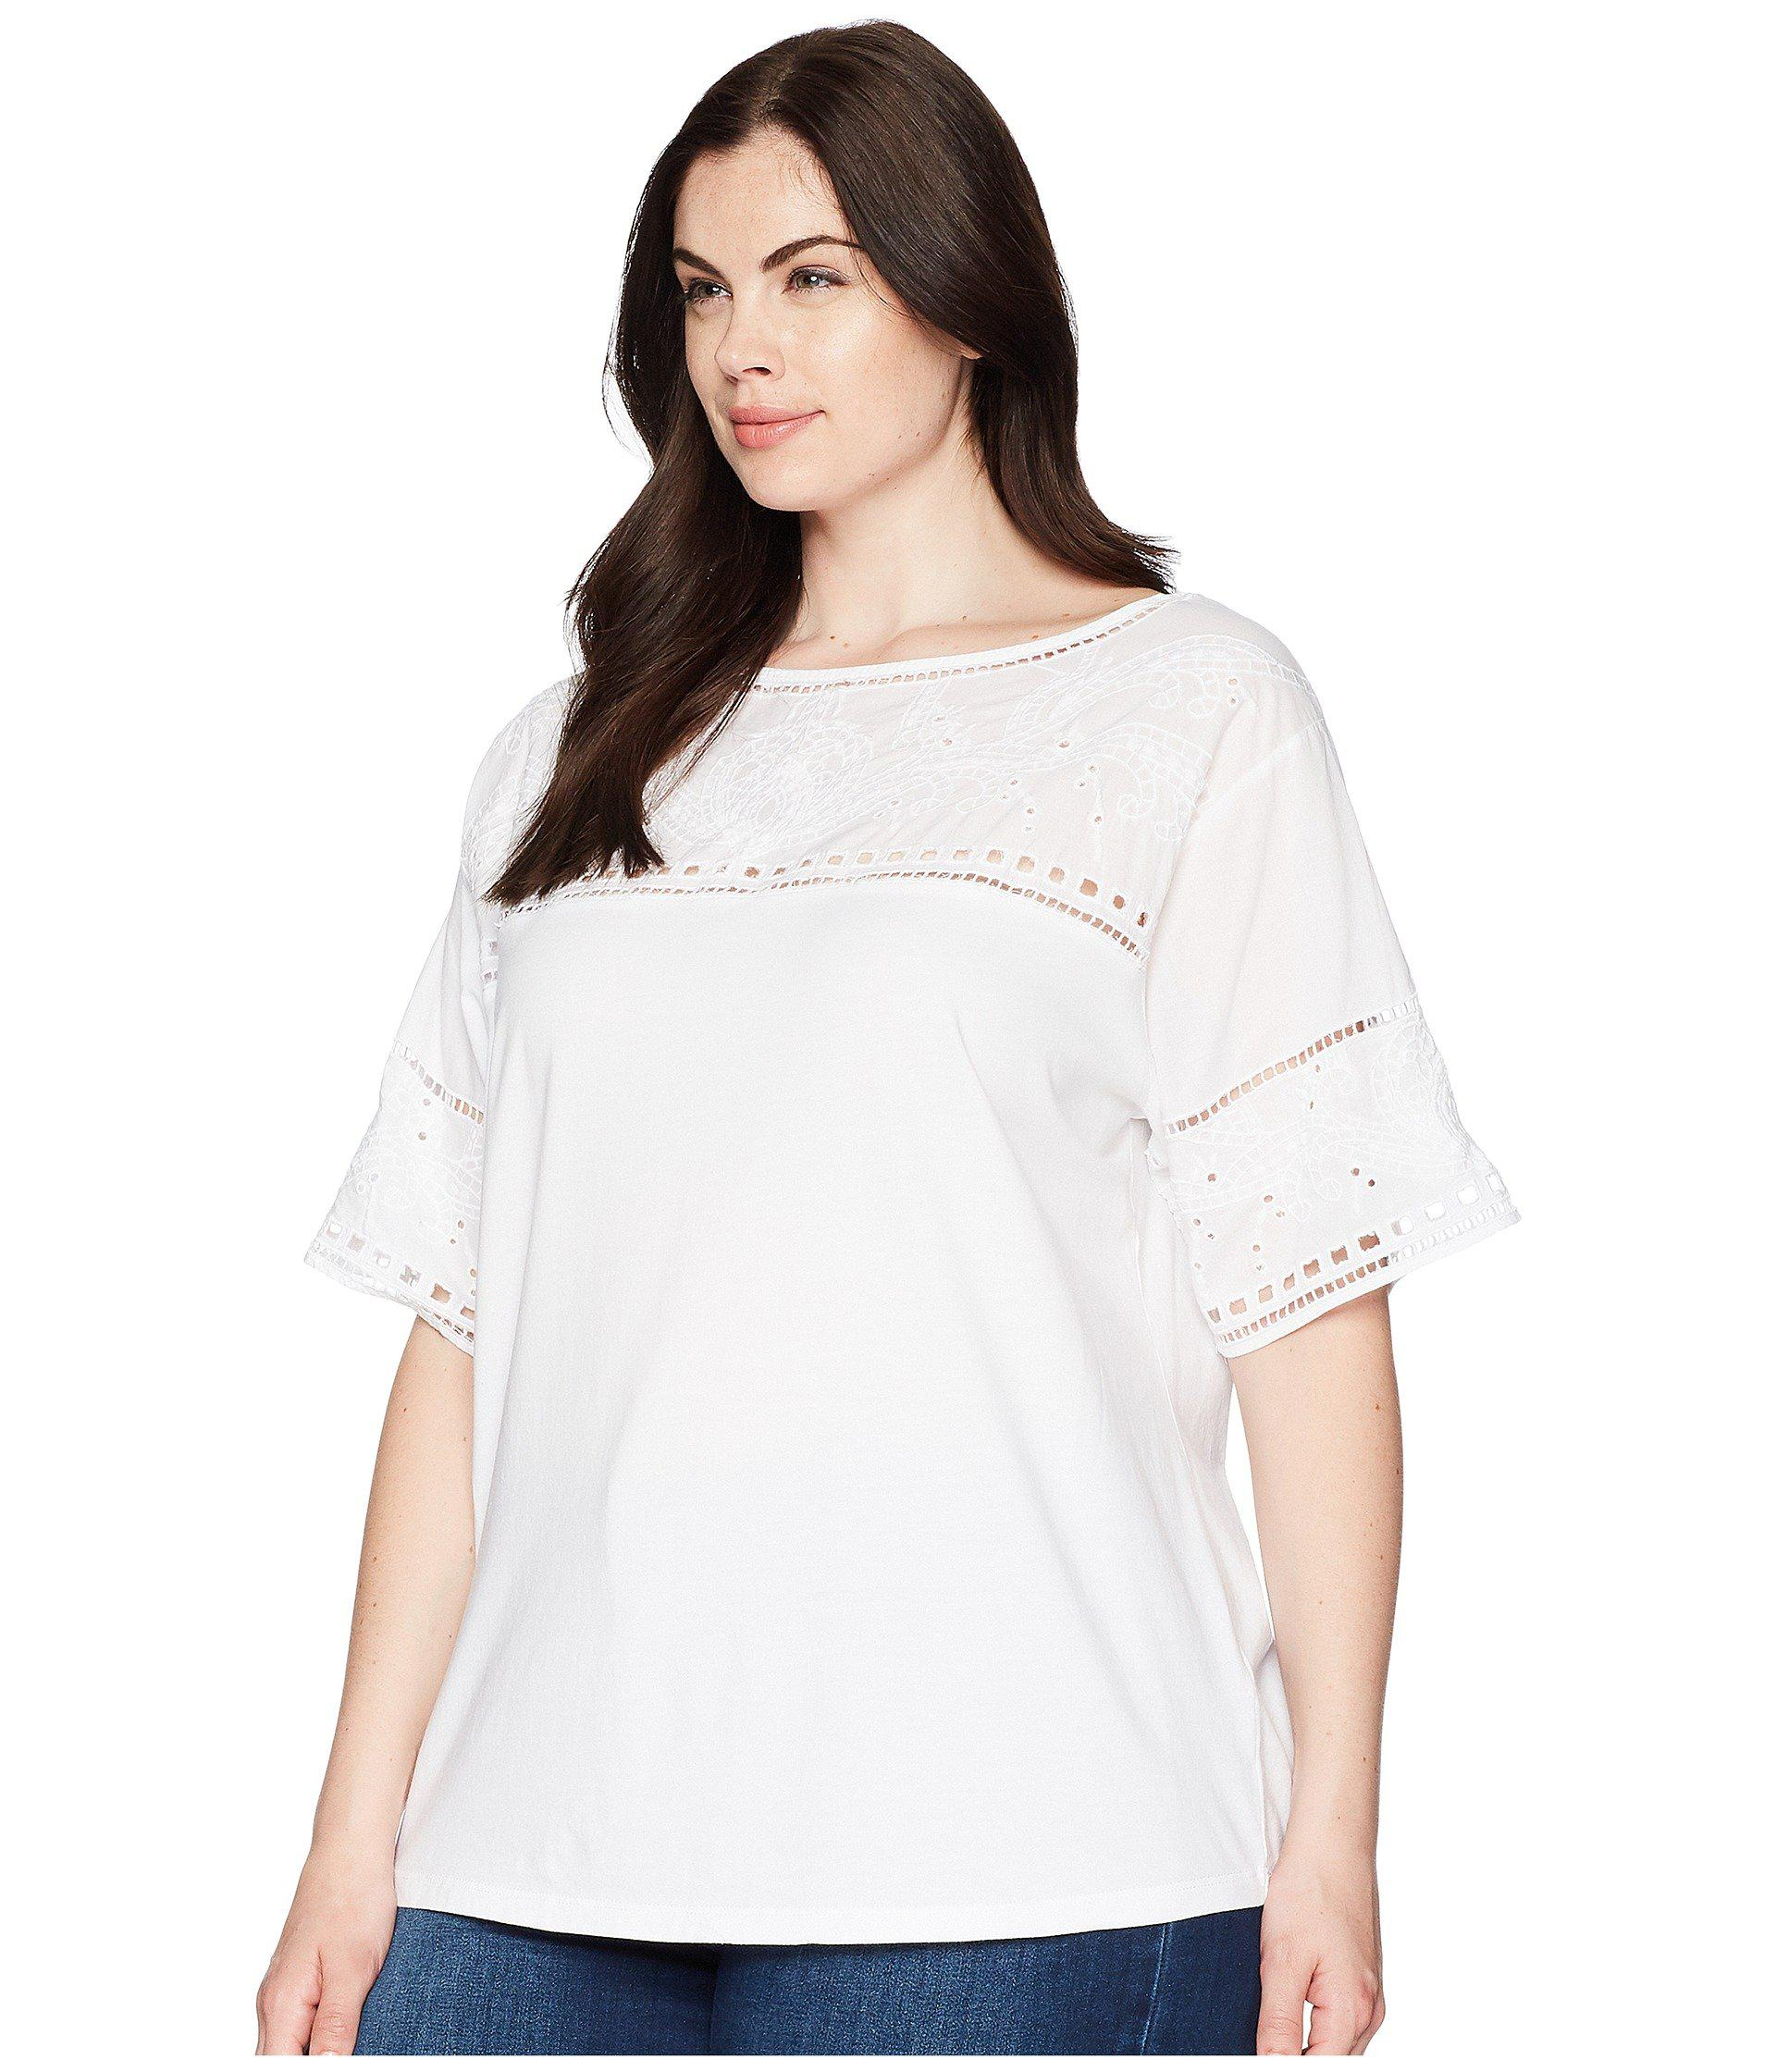 74b624023e6 Lyst - Lauren by Ralph Lauren Plus Size Eyelet Cotton-blend T-shirt in  White - Save 57%